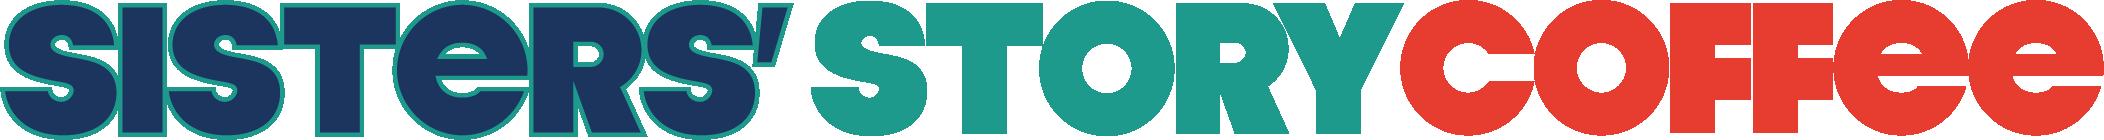 Sisters' Story Coffee Logo